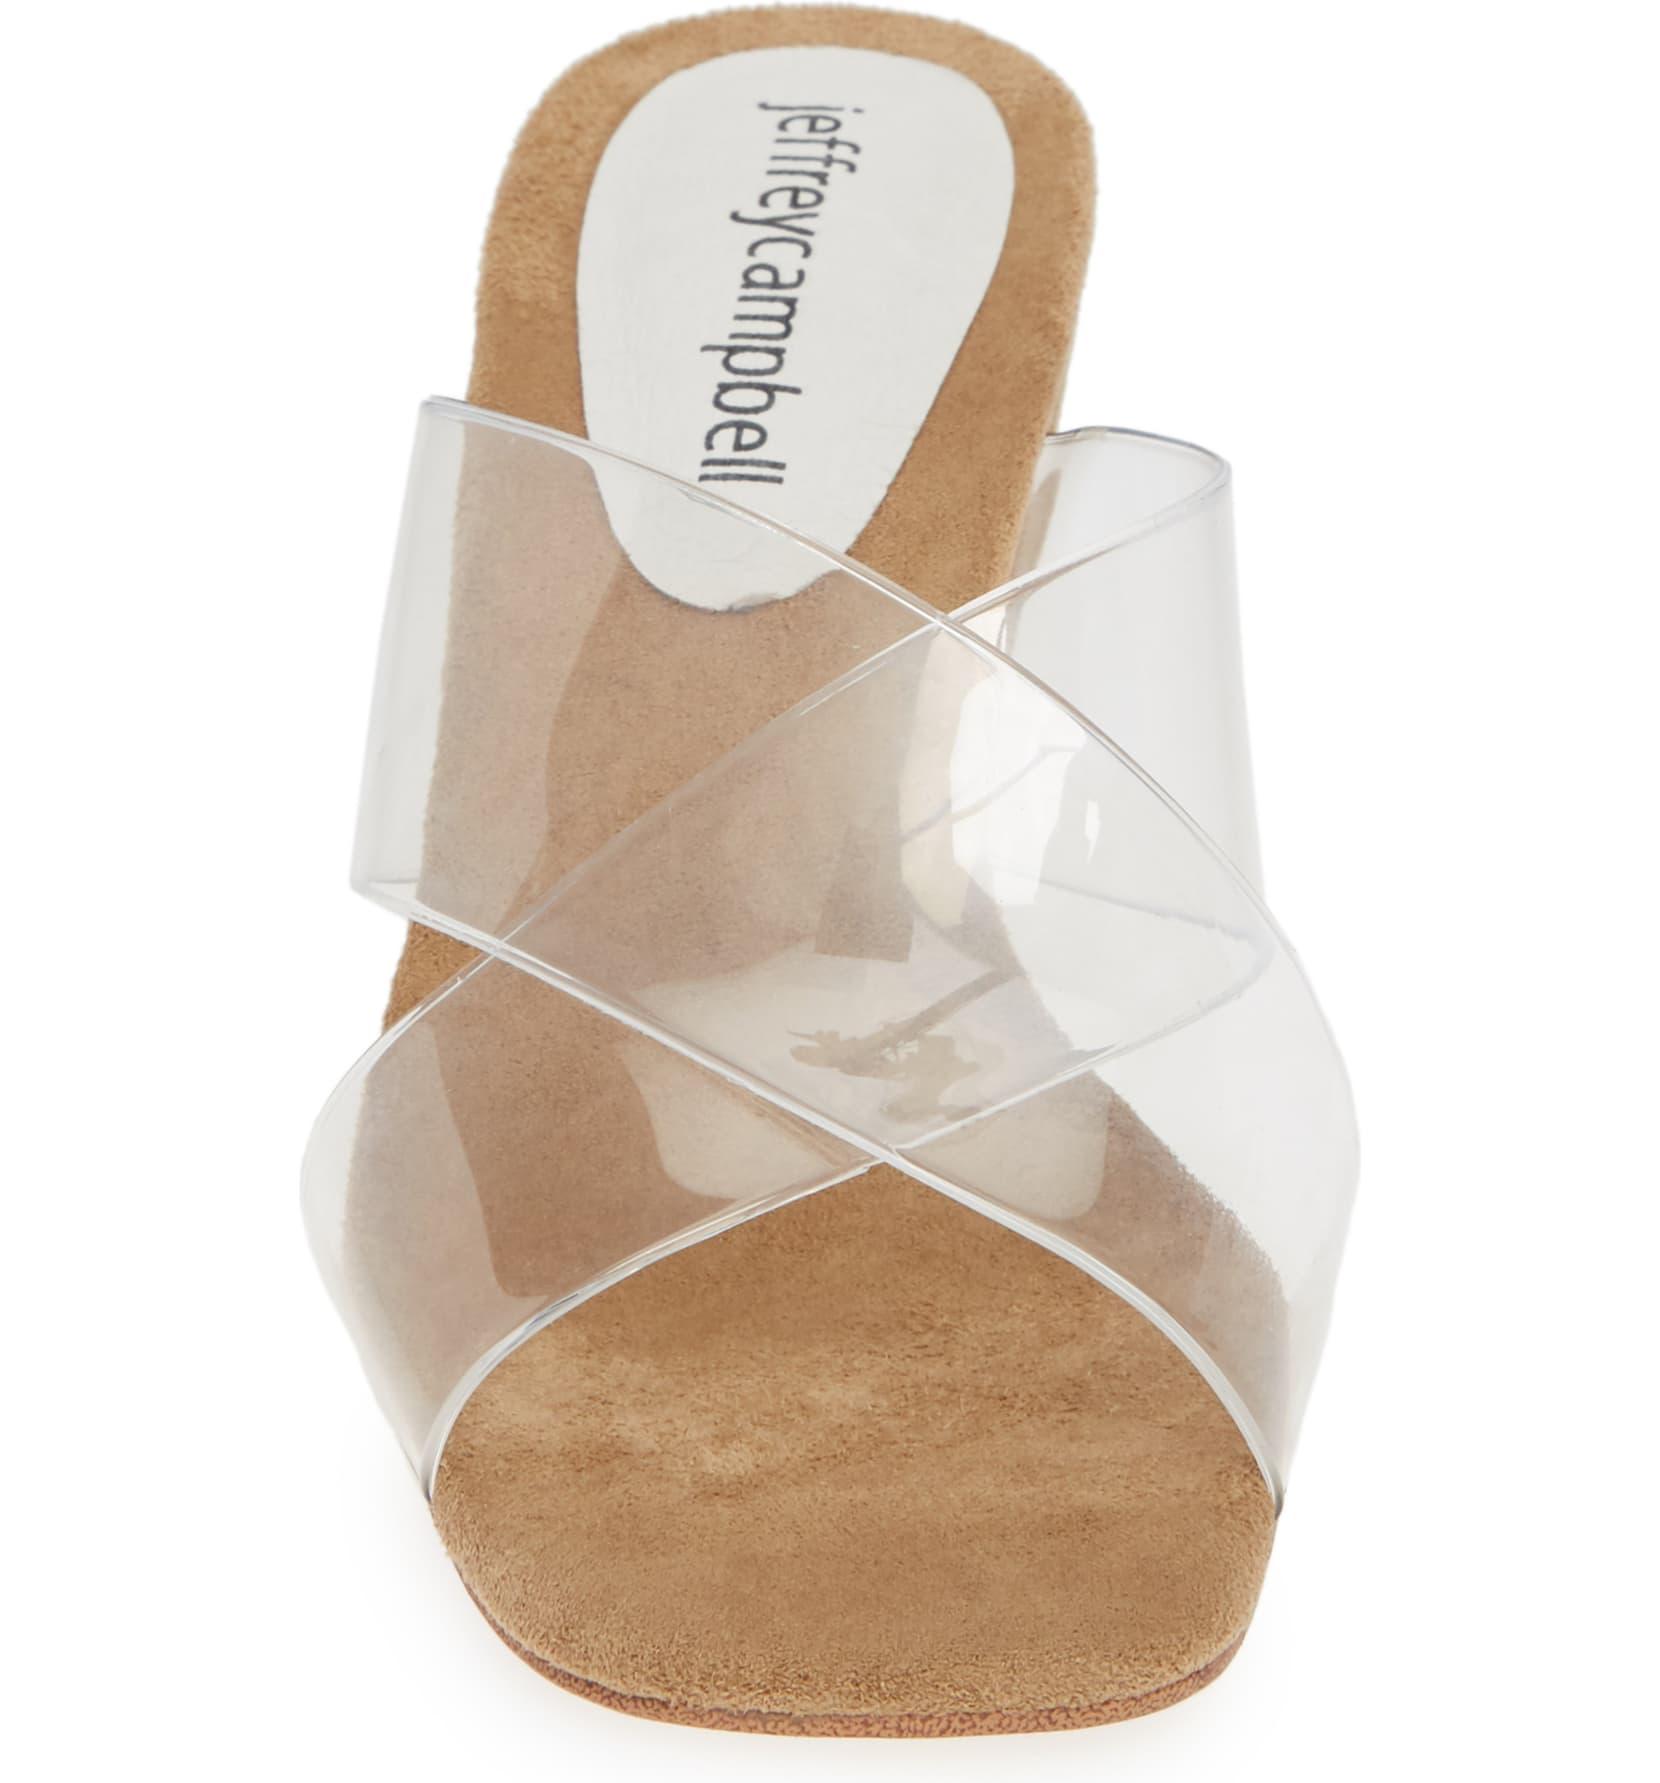 Jeffrey-Campbell-Women-039-s-Mystical-Wedge-Transparent-Straps-Wedge-Heeled-Sandals thumbnail 5